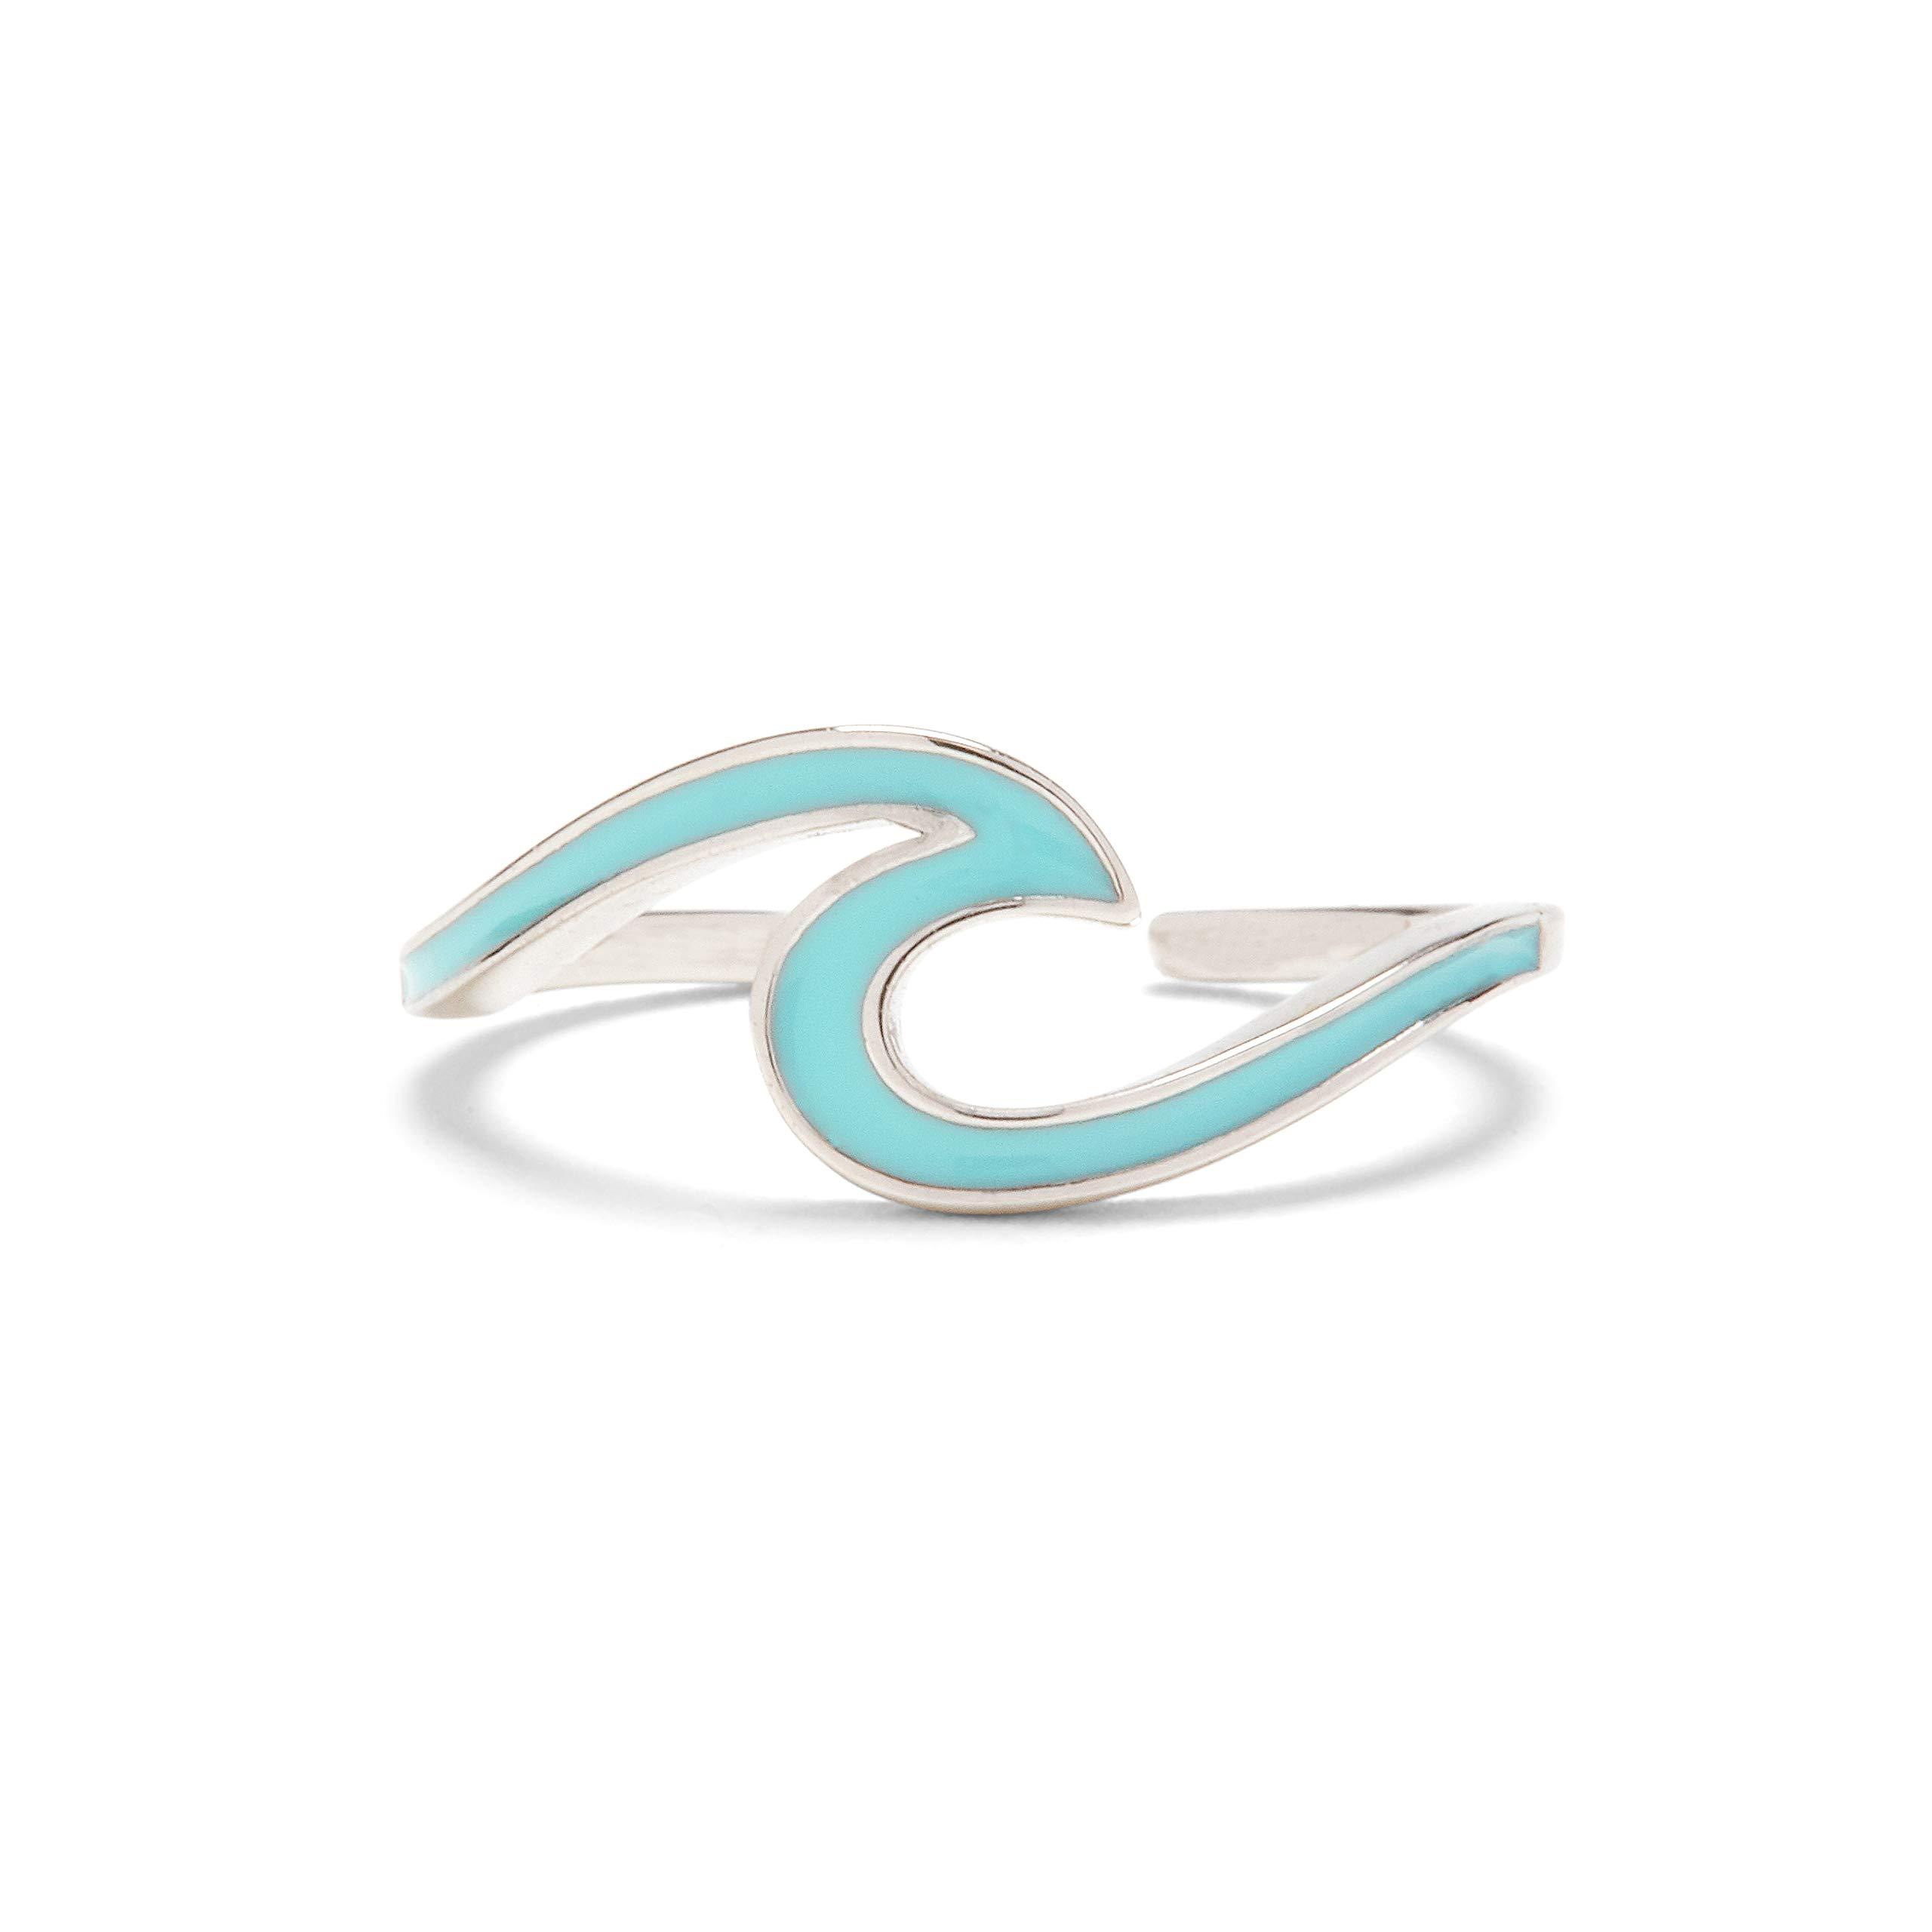 Pura Vida Silver Enamel Wave Toe Ring - Brass Base Adjustable End - One Size